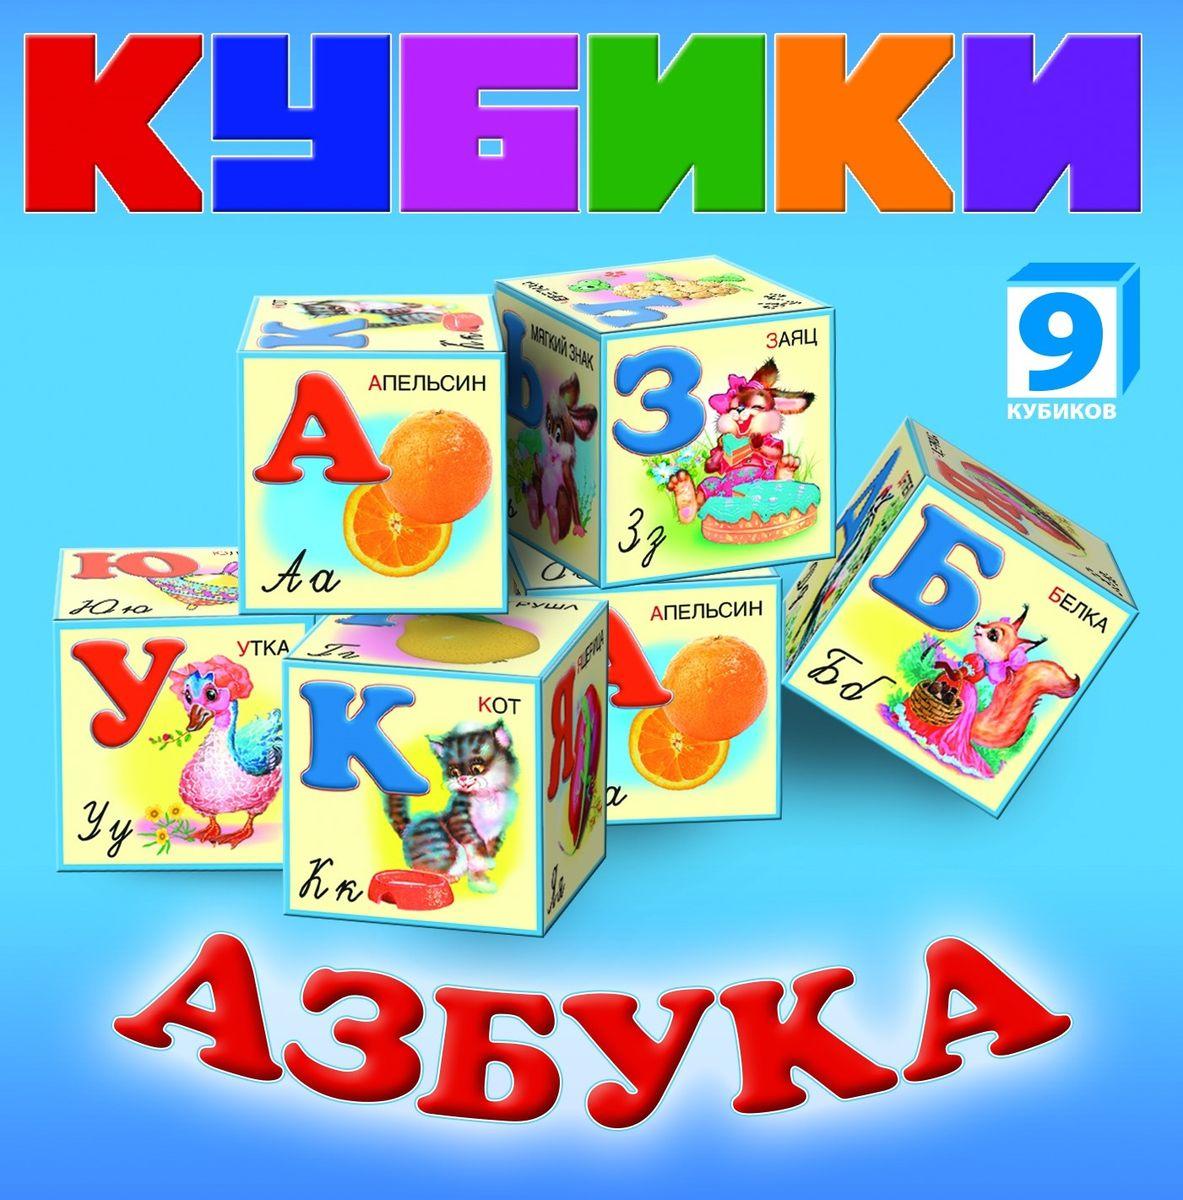 Dream Makers Набор кубиков АзбукаKB1606Развивающие кубики для детей. Набор предназначен для детей от 3 лет. Состав: 9 кубиков.